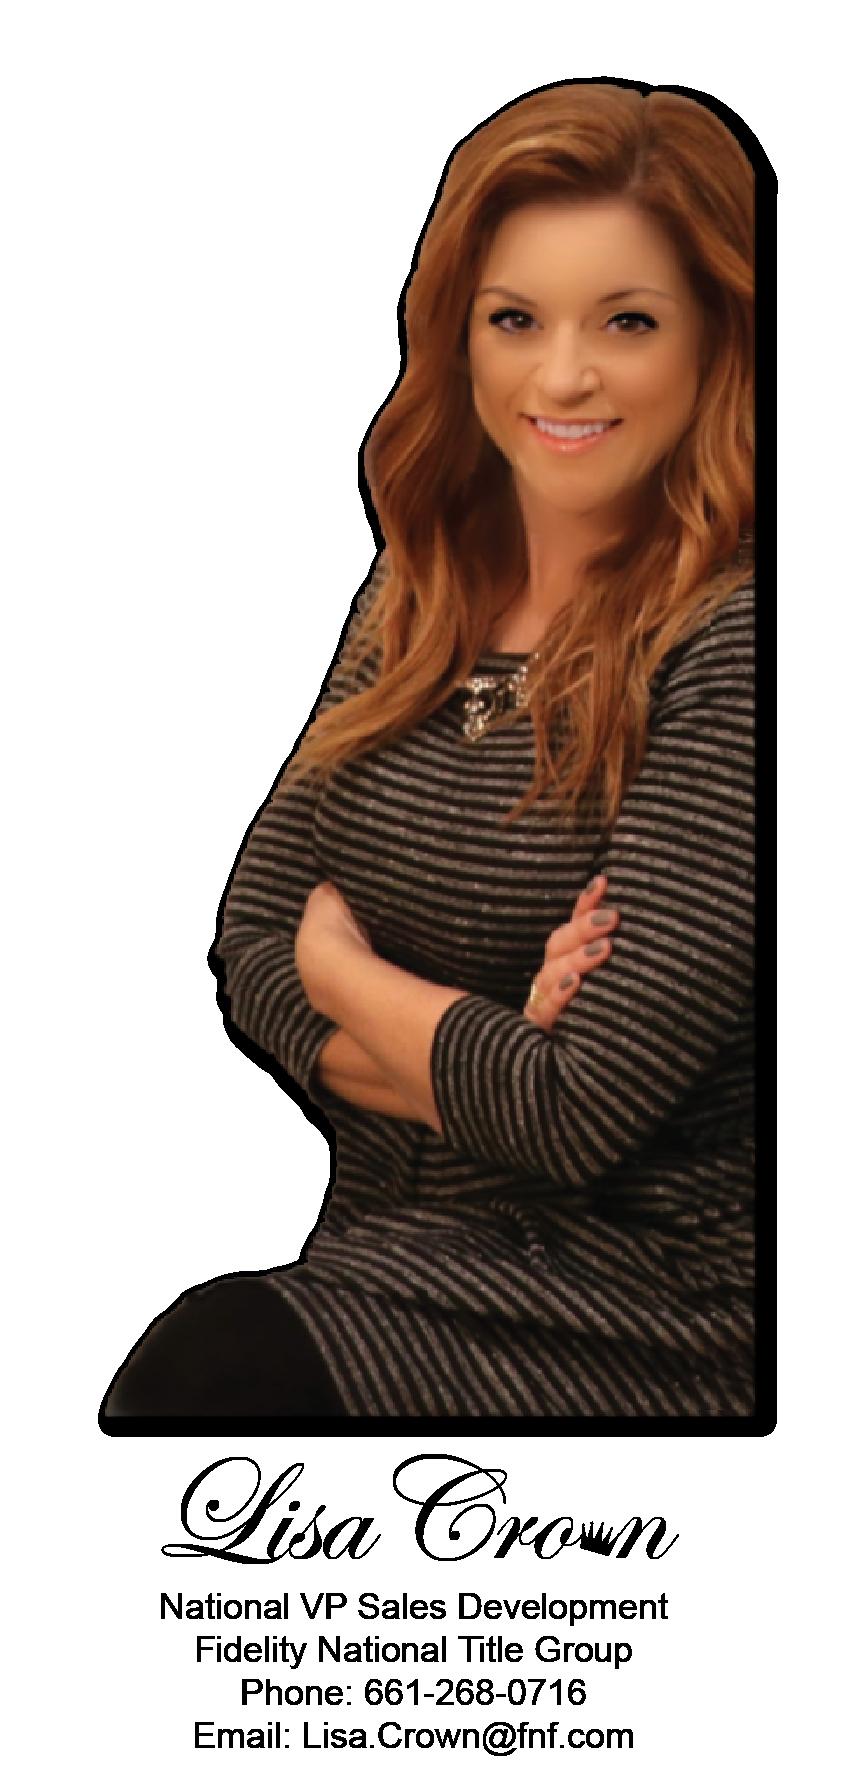 Lisa Crown - VP of Sales and Development